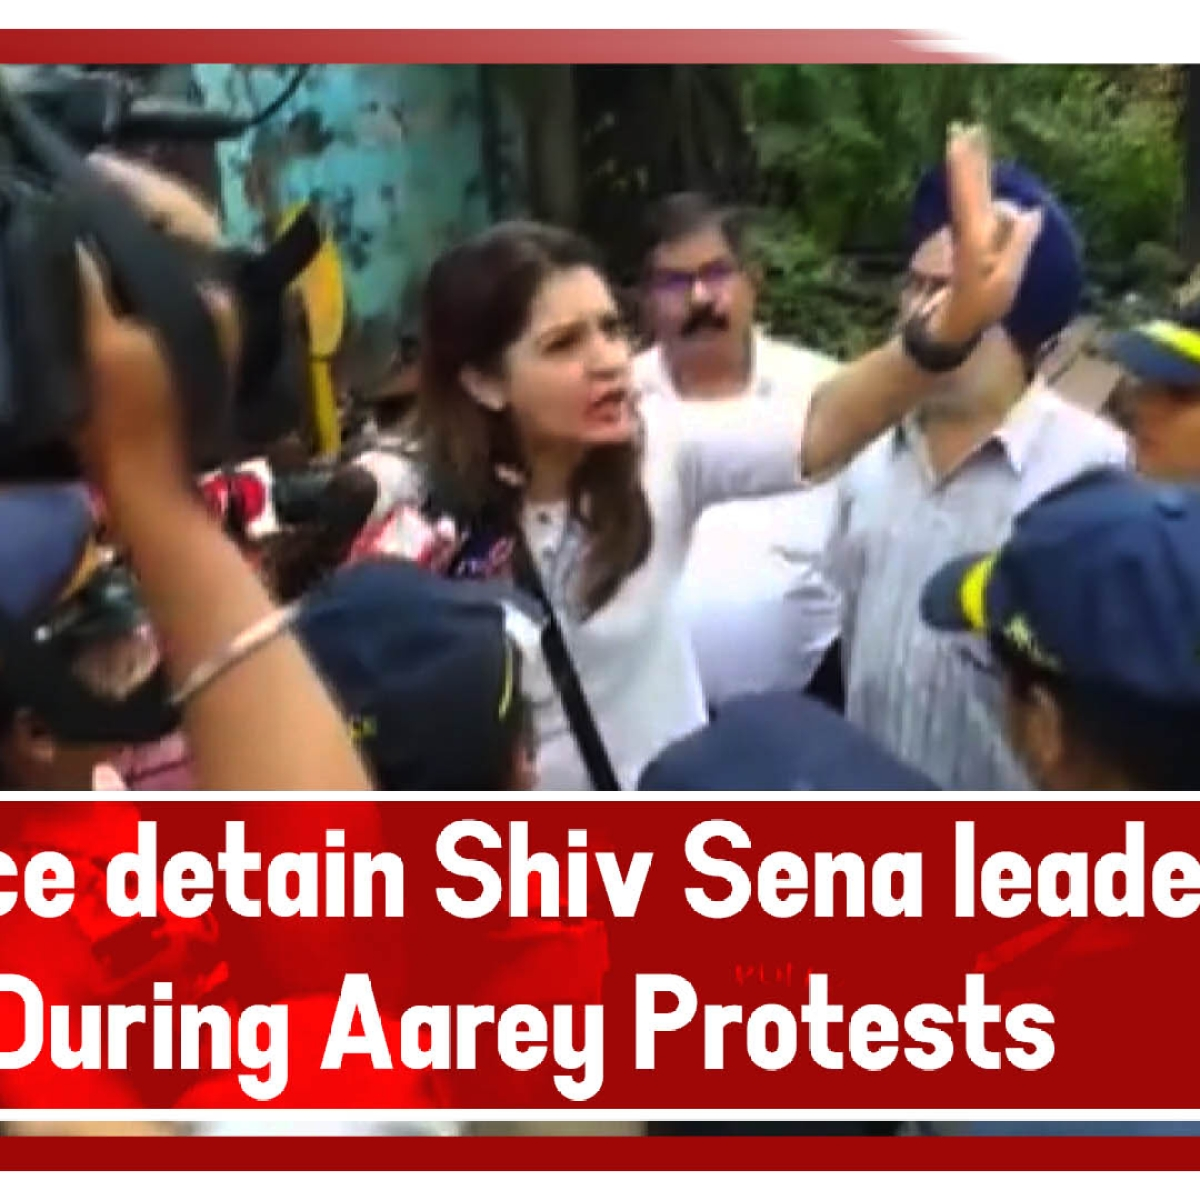 Police Detain Shiv Sena Leader Priyanka Chaturvedi During Aarey Protests